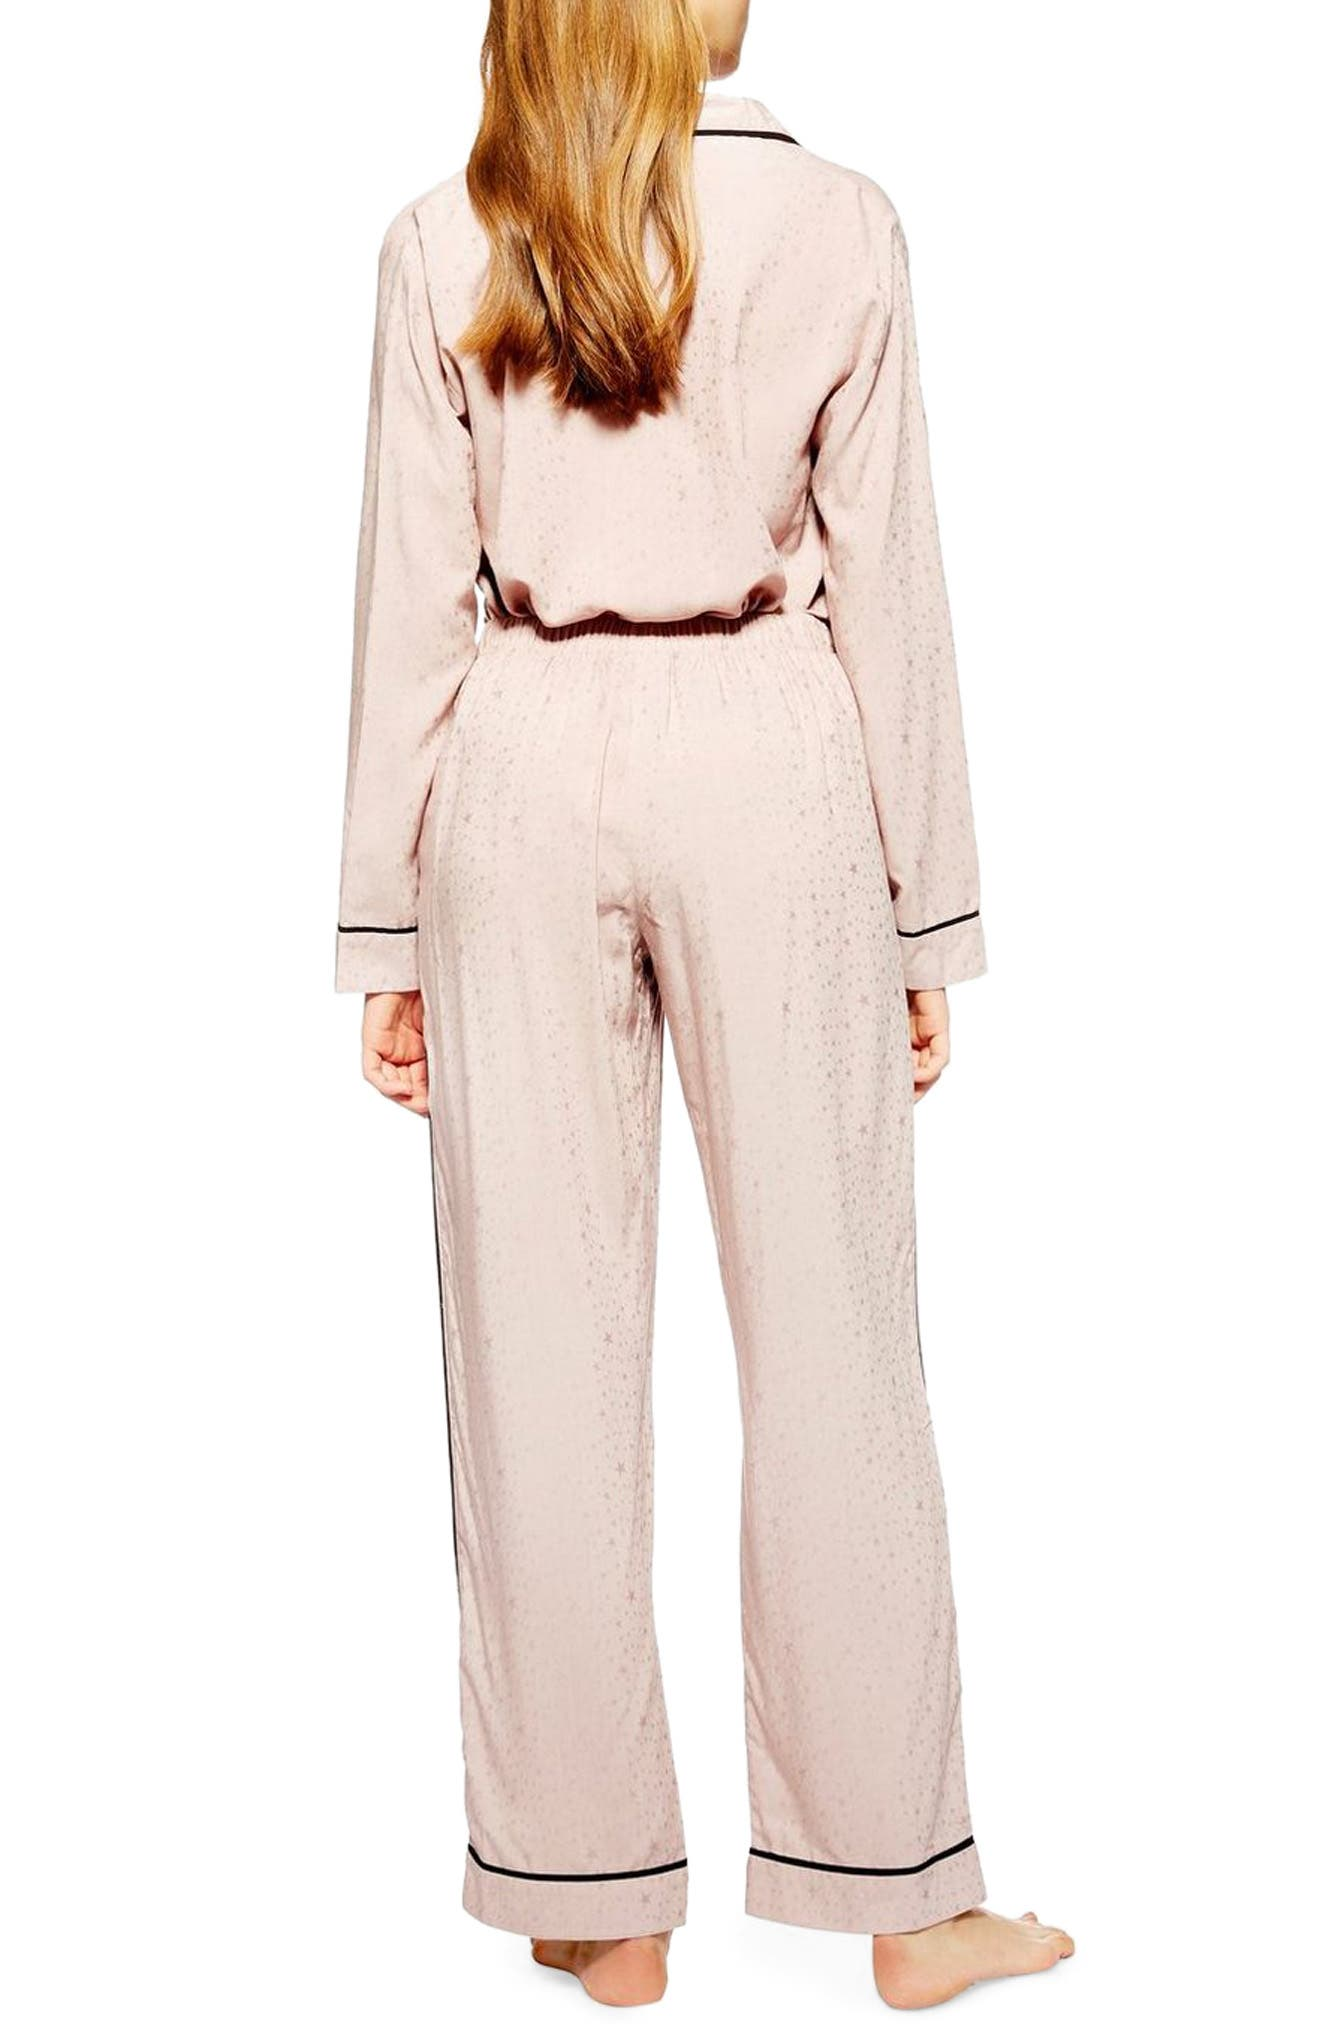 Star Jacquard Pajama Pants,                             Alternate thumbnail 2, color,                             NUDE MULTI